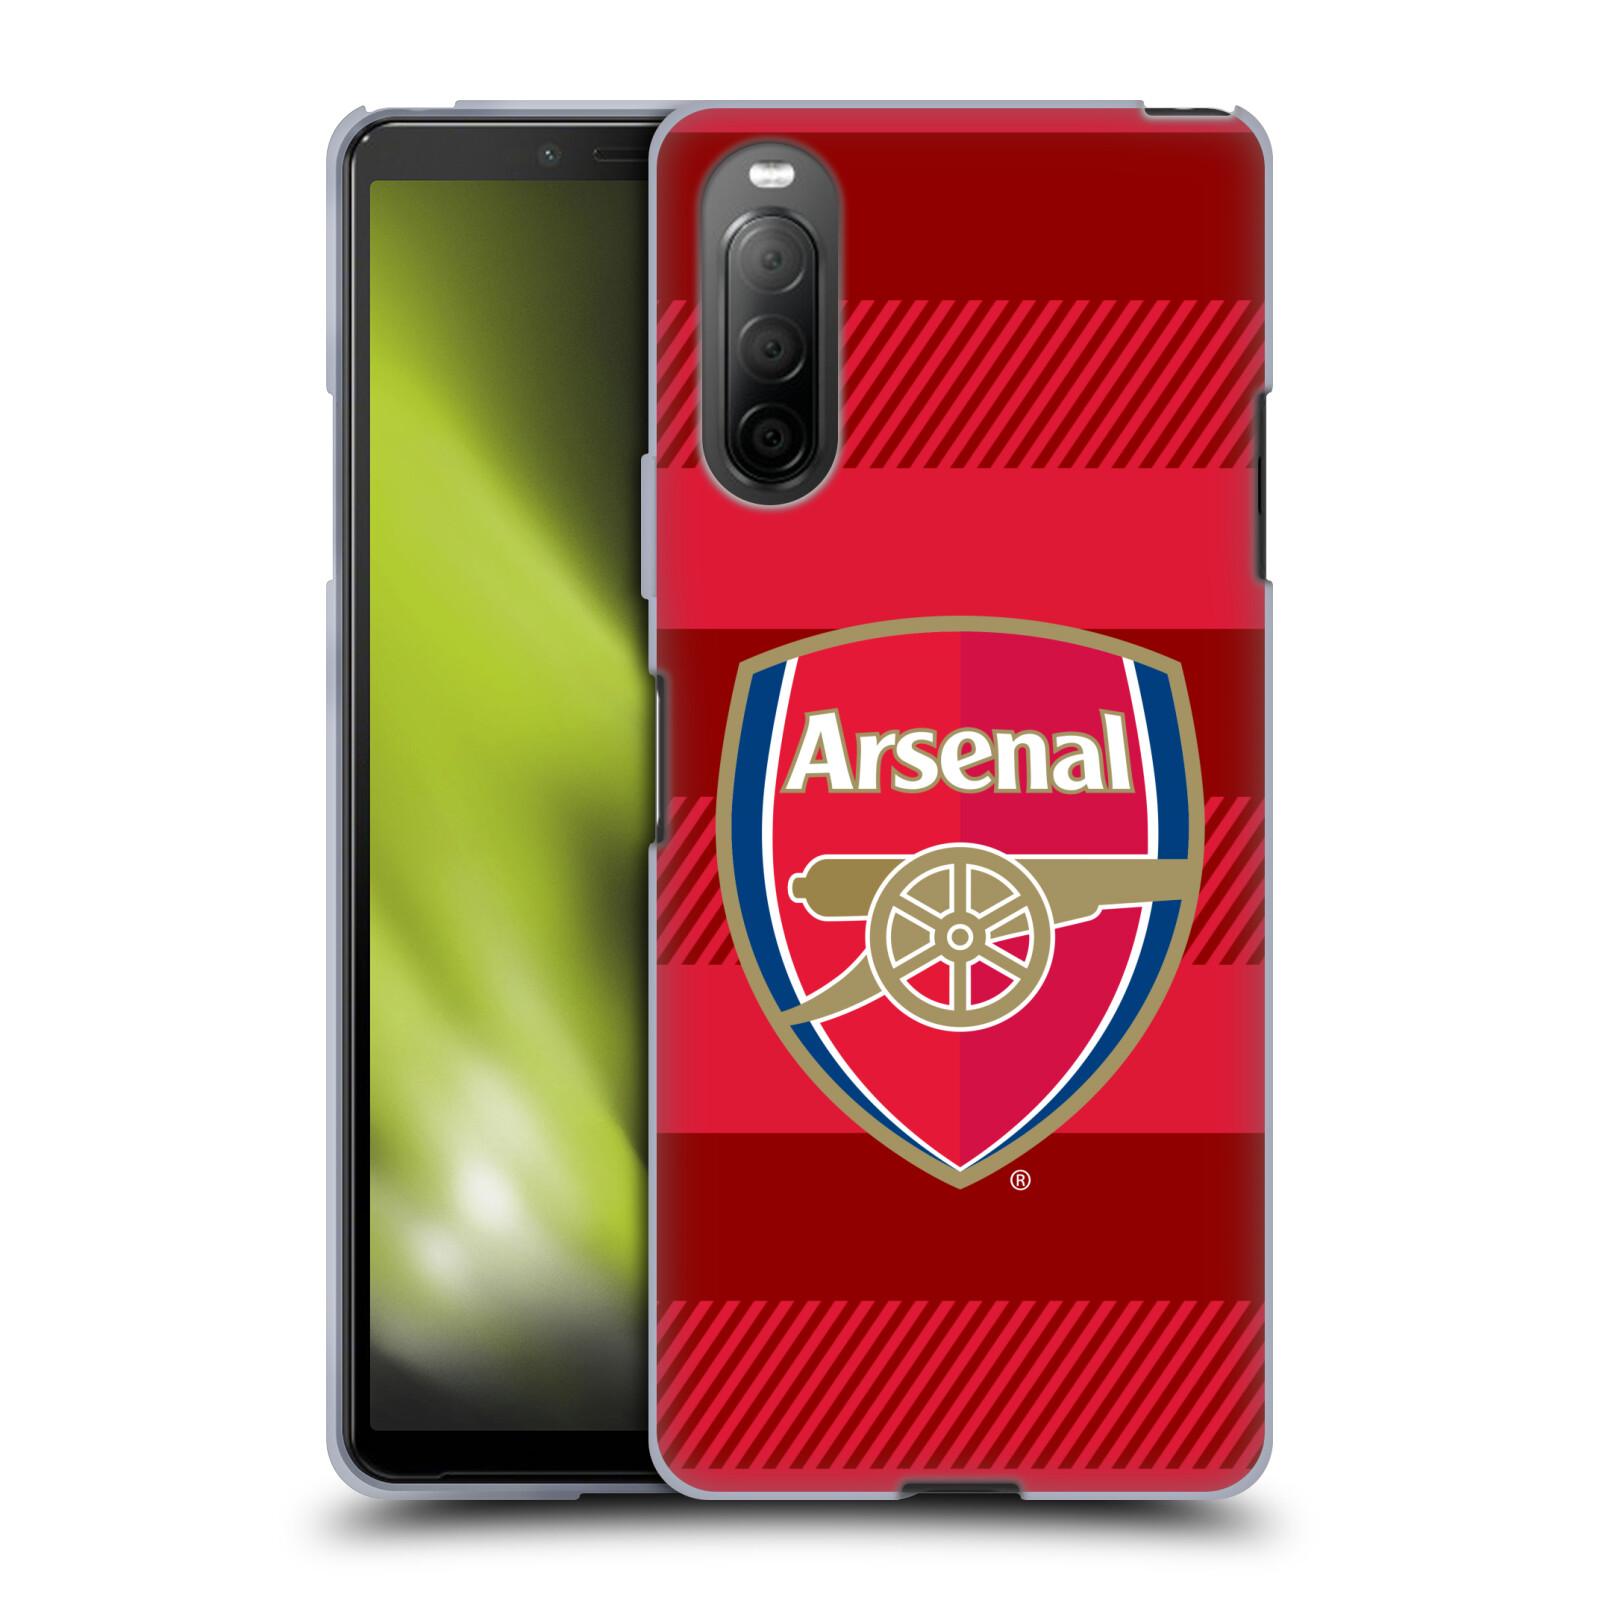 Silikonové pouzdro na mobil Sony Xperia 10 II - Head Case - Arsenal FC - Logo s pruhy